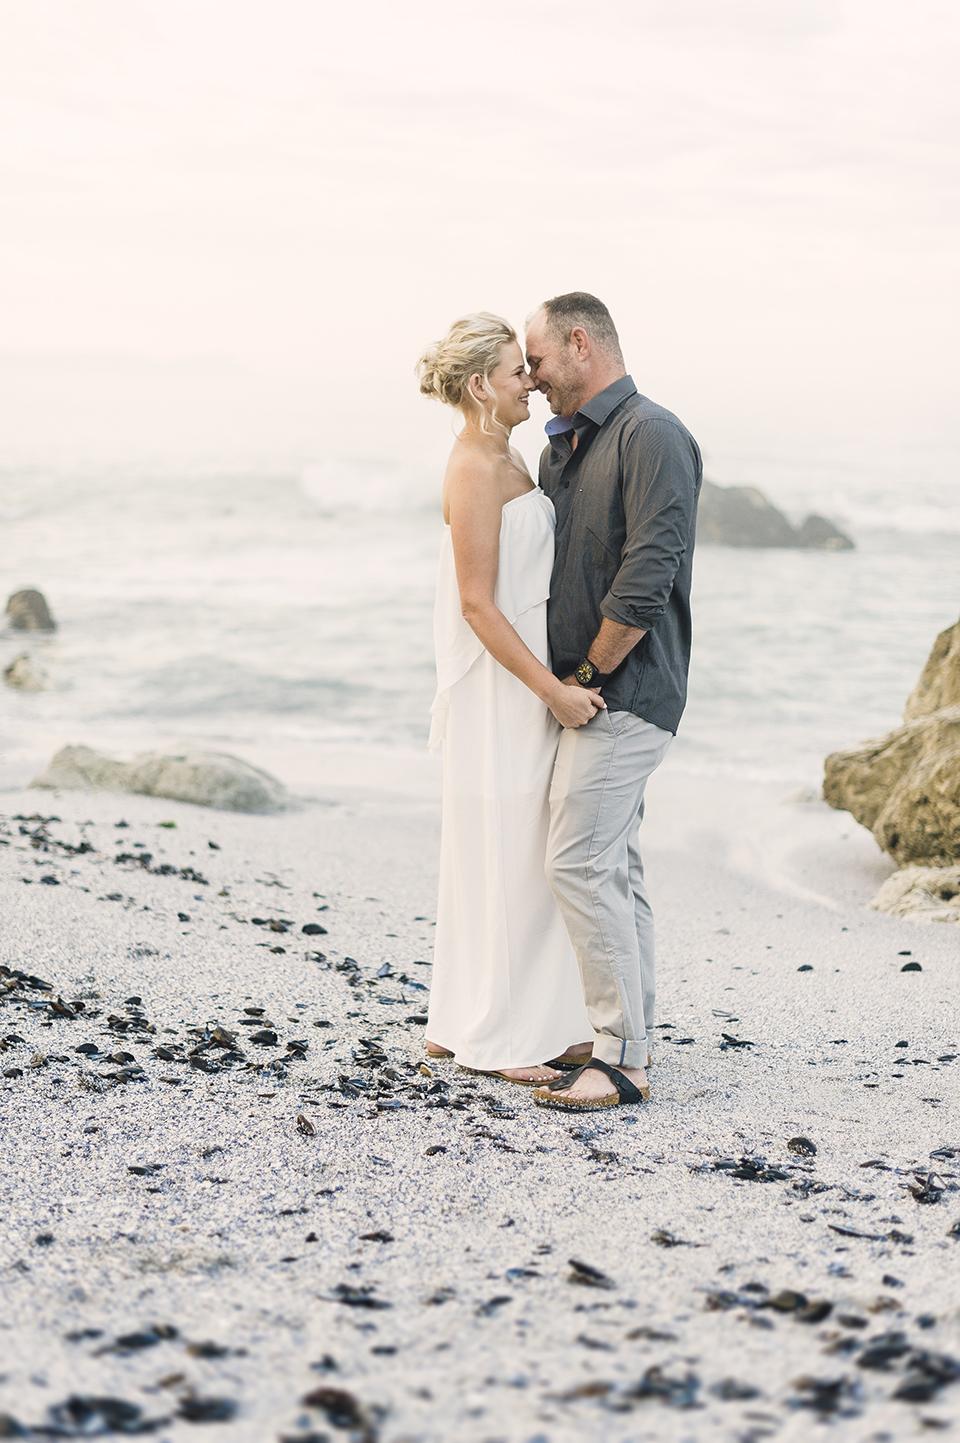 RyanParker_CapeTown_Photographer_Wedding_Hermanus_A&B_DSC_9134.jpg